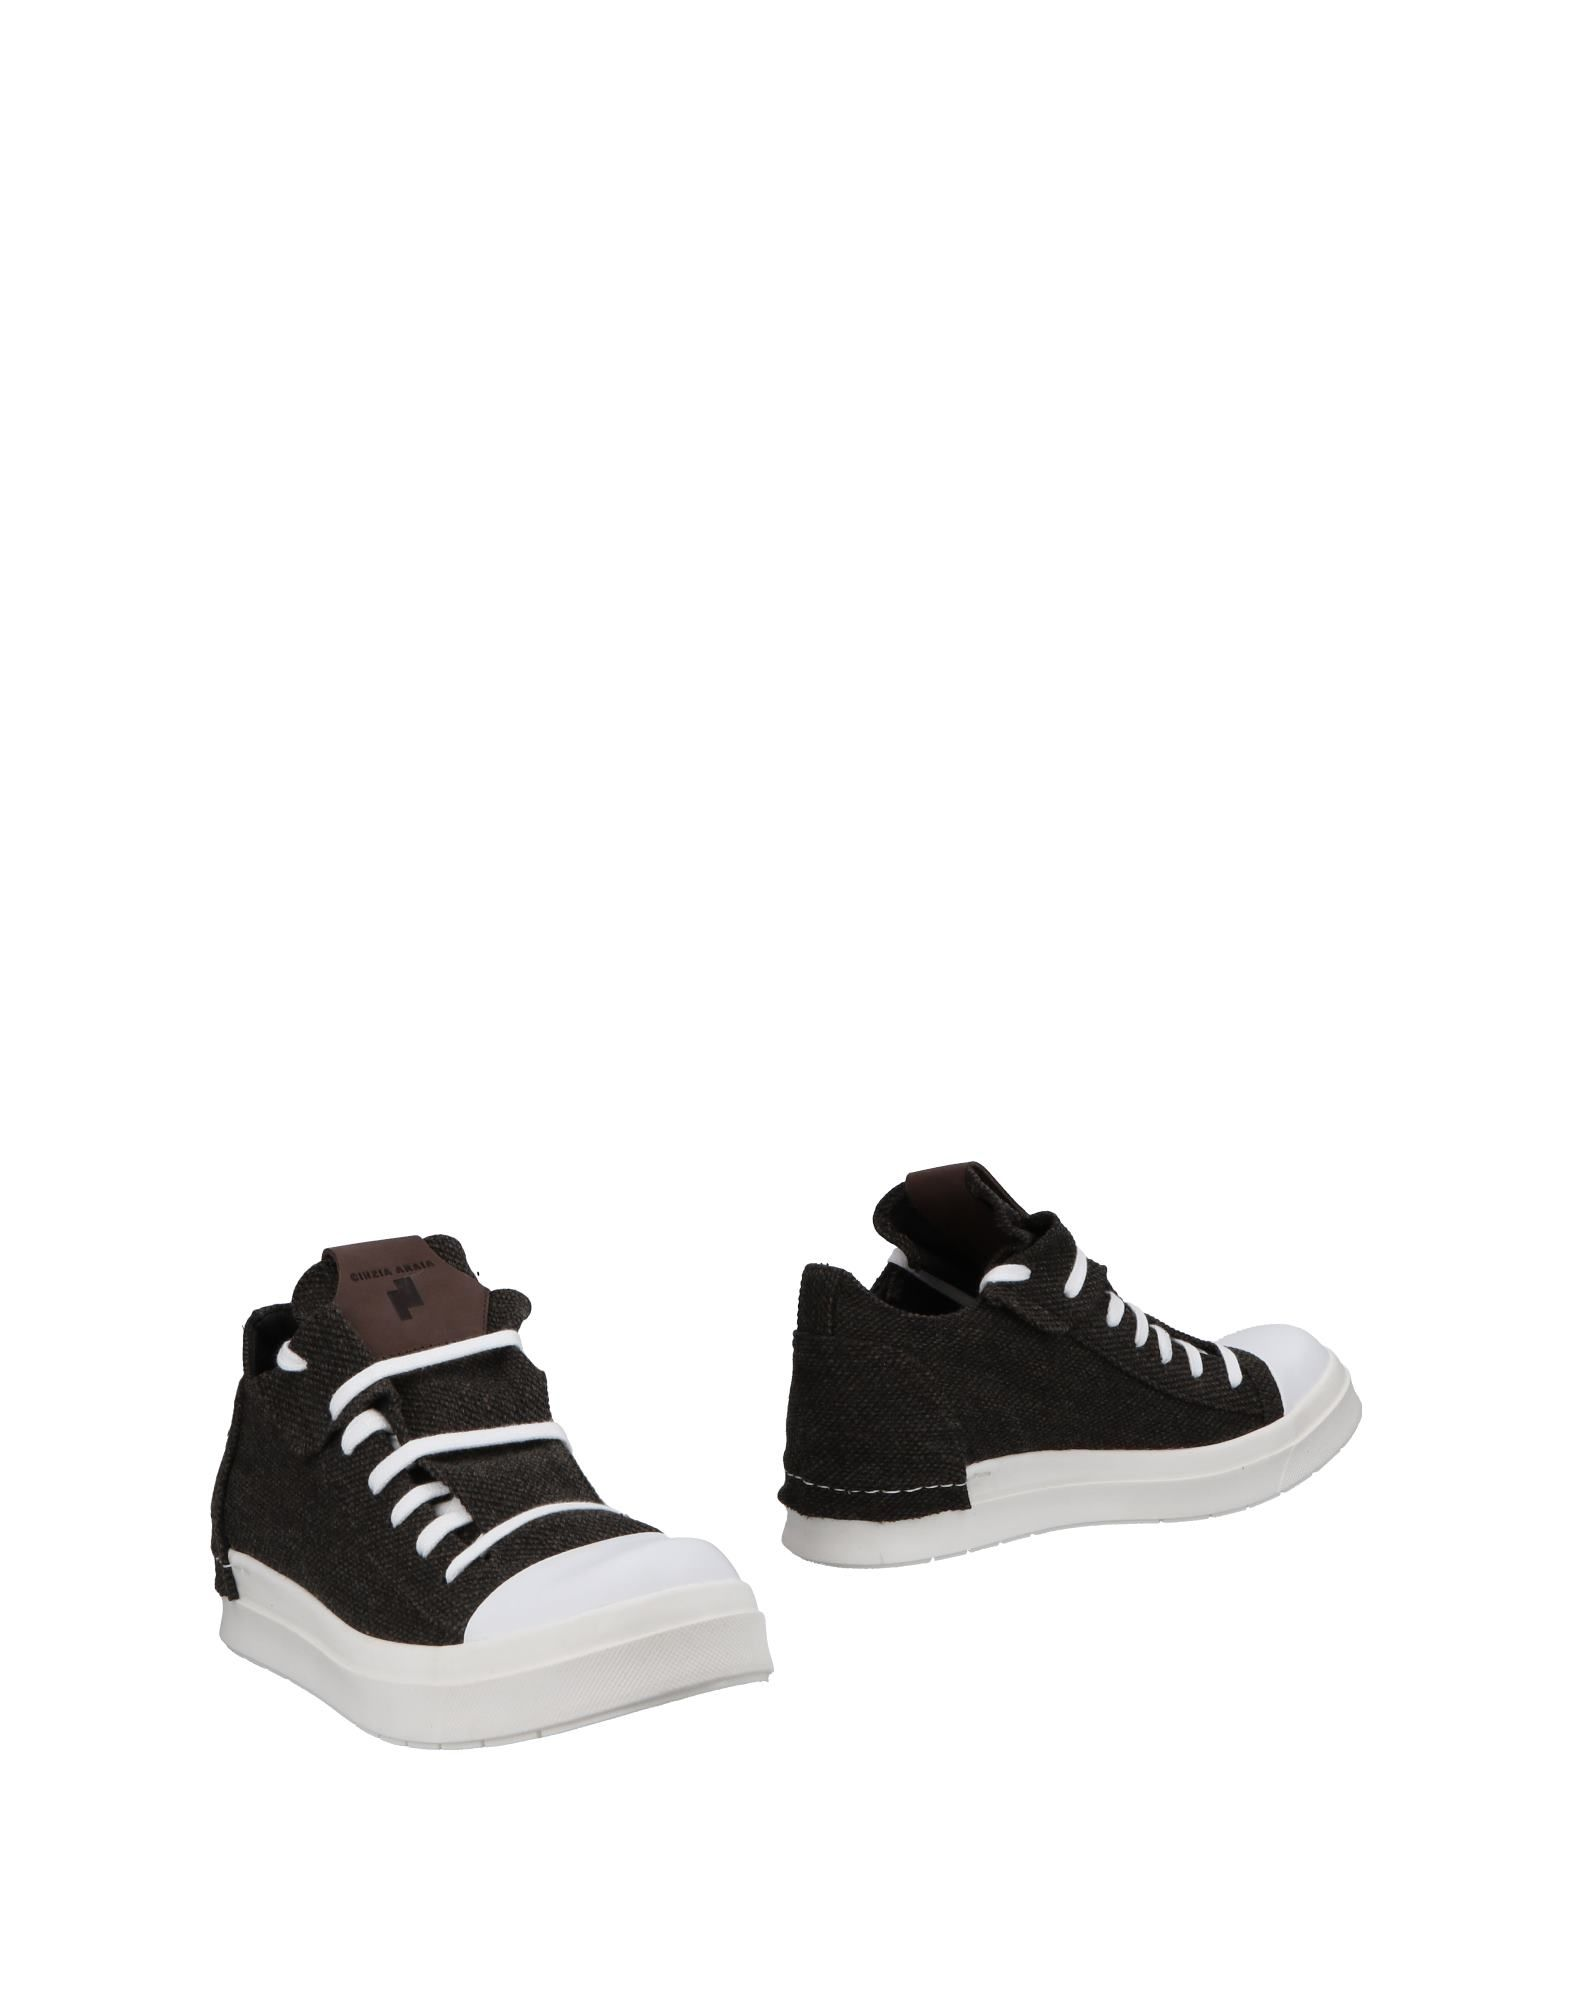 Cinzia Araia Sneakers Herren  11494179CE Gute Qualität beliebte Schuhe